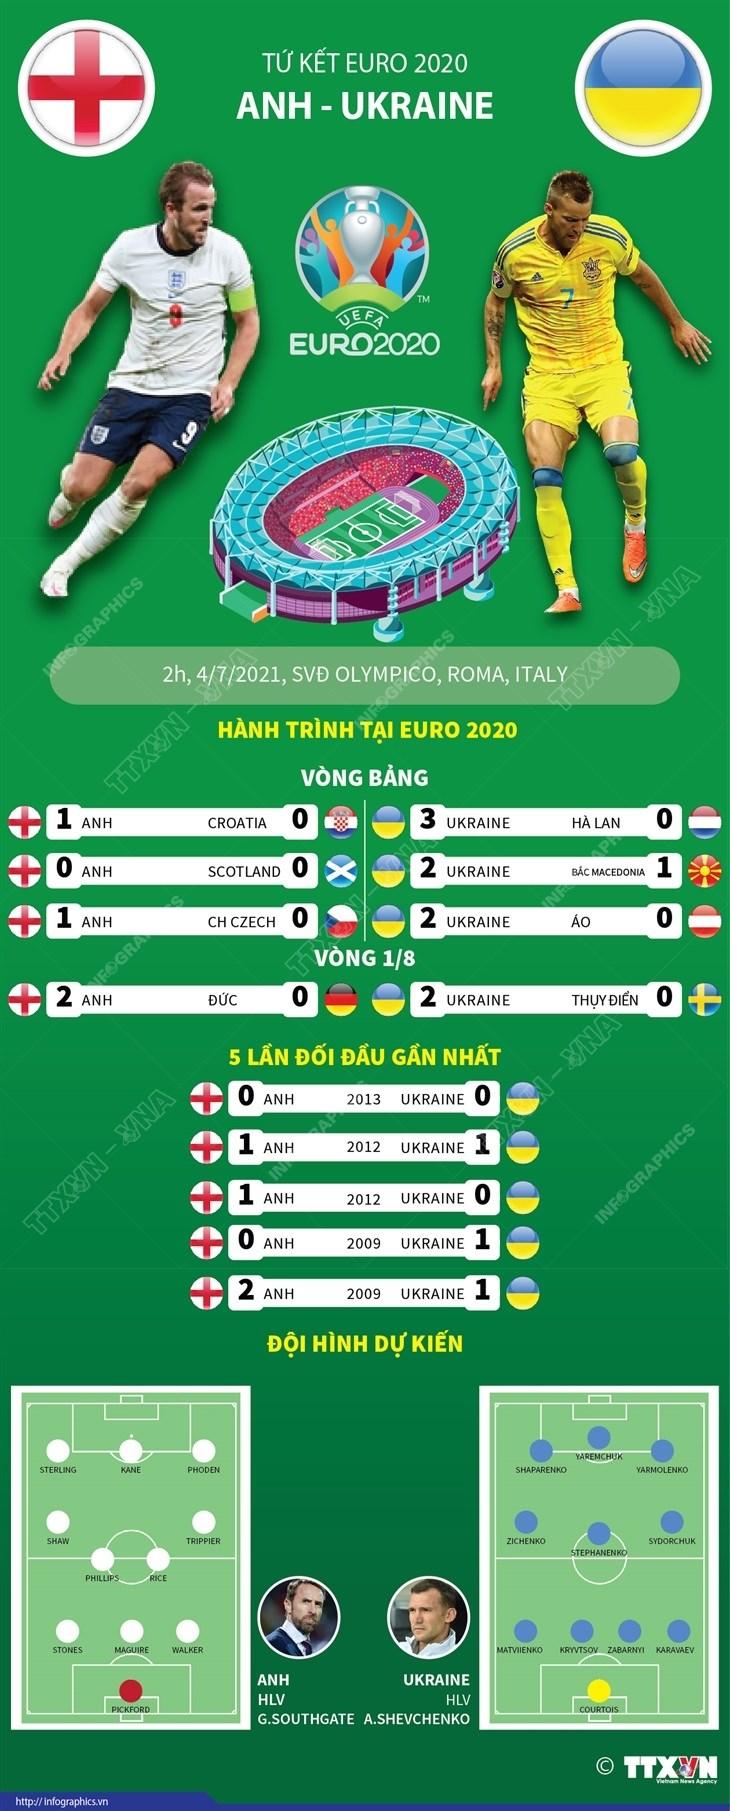 [Infographics] So sanh suc manh cua 2 doi Anh va Ukraine hinh anh 1